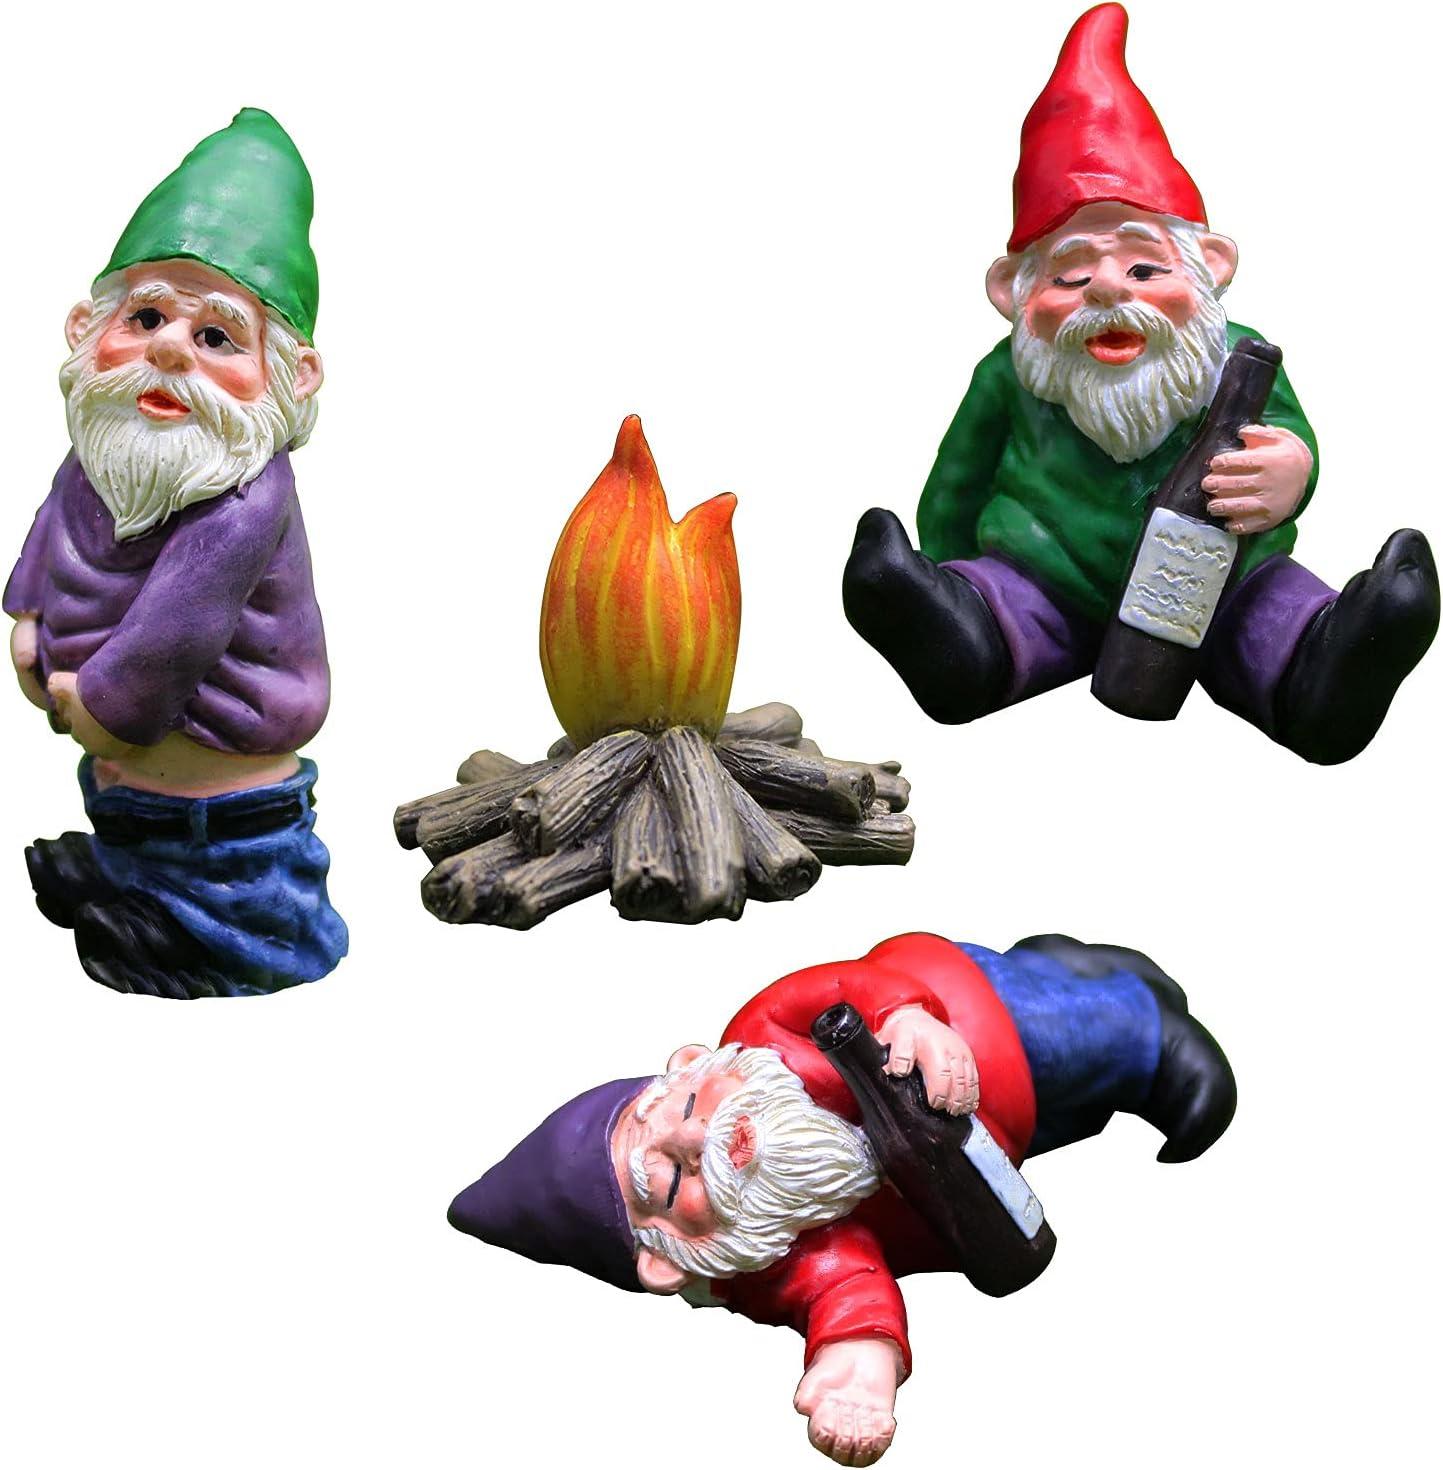 Garden Gnomes 4pcs - Resin Drunken Gnome Garden Decorations Fairy Garden Accessories Collectible Figurines Miniature Gardening Gnomes Figurines Ornaments - Drunk Gnome Kit